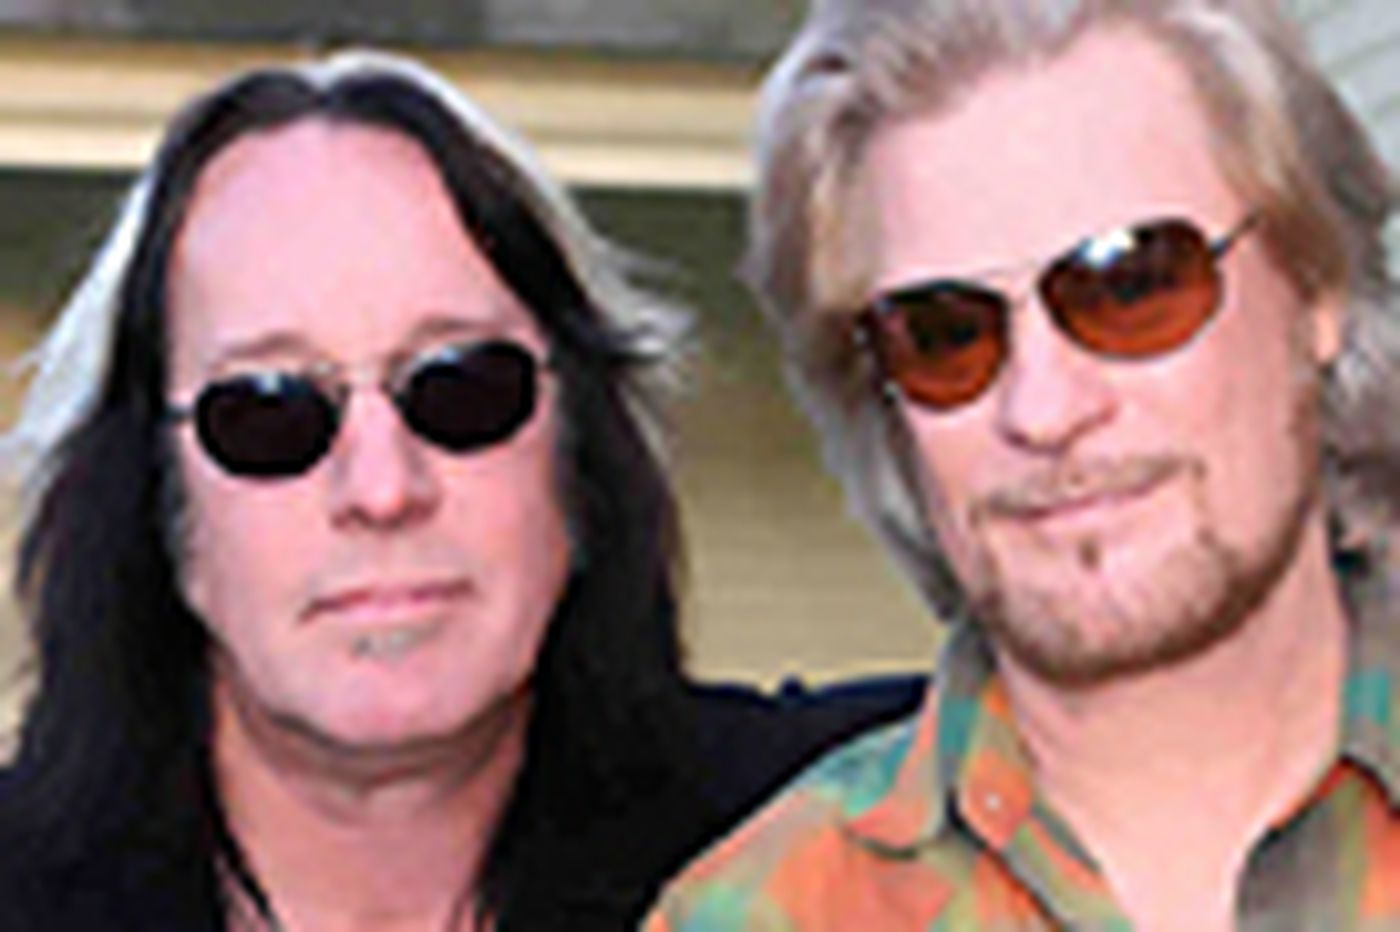 Hall and Rundgren: Brotherly love at Borgata